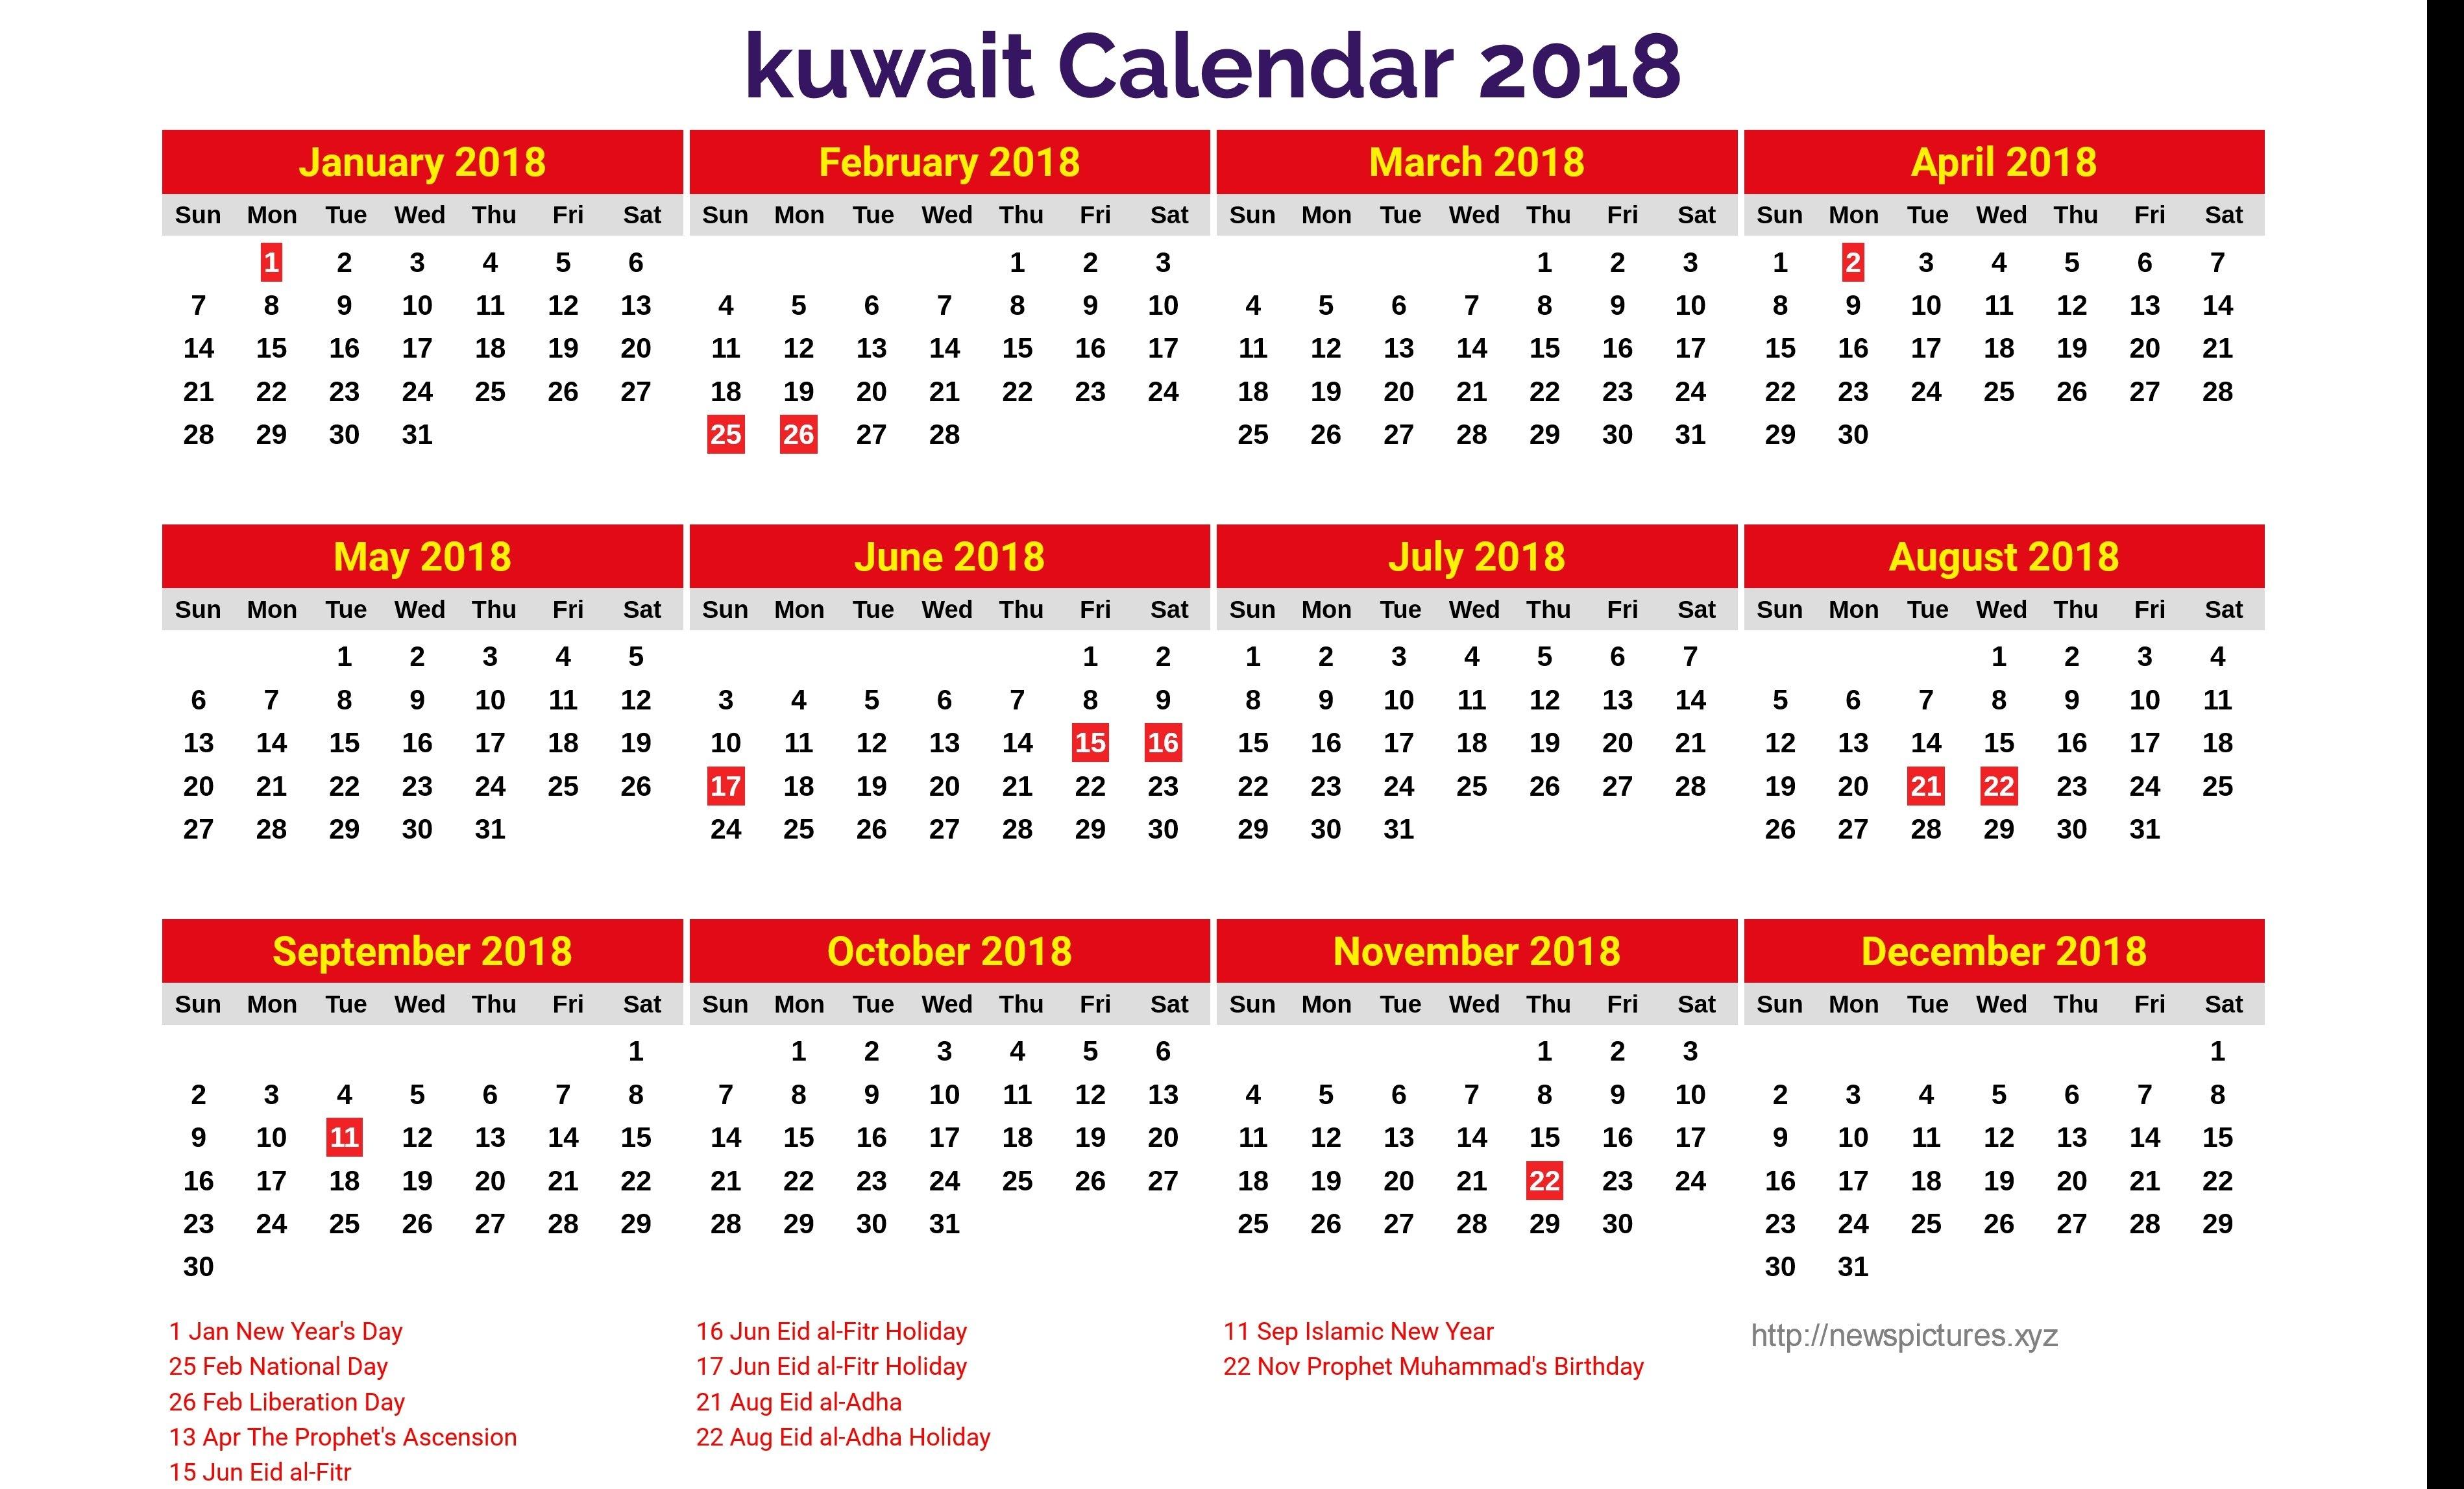 Get Free Templates Yearly Calendar 2019 Kuwait Holiday Download Calendar 2019 Kuwait